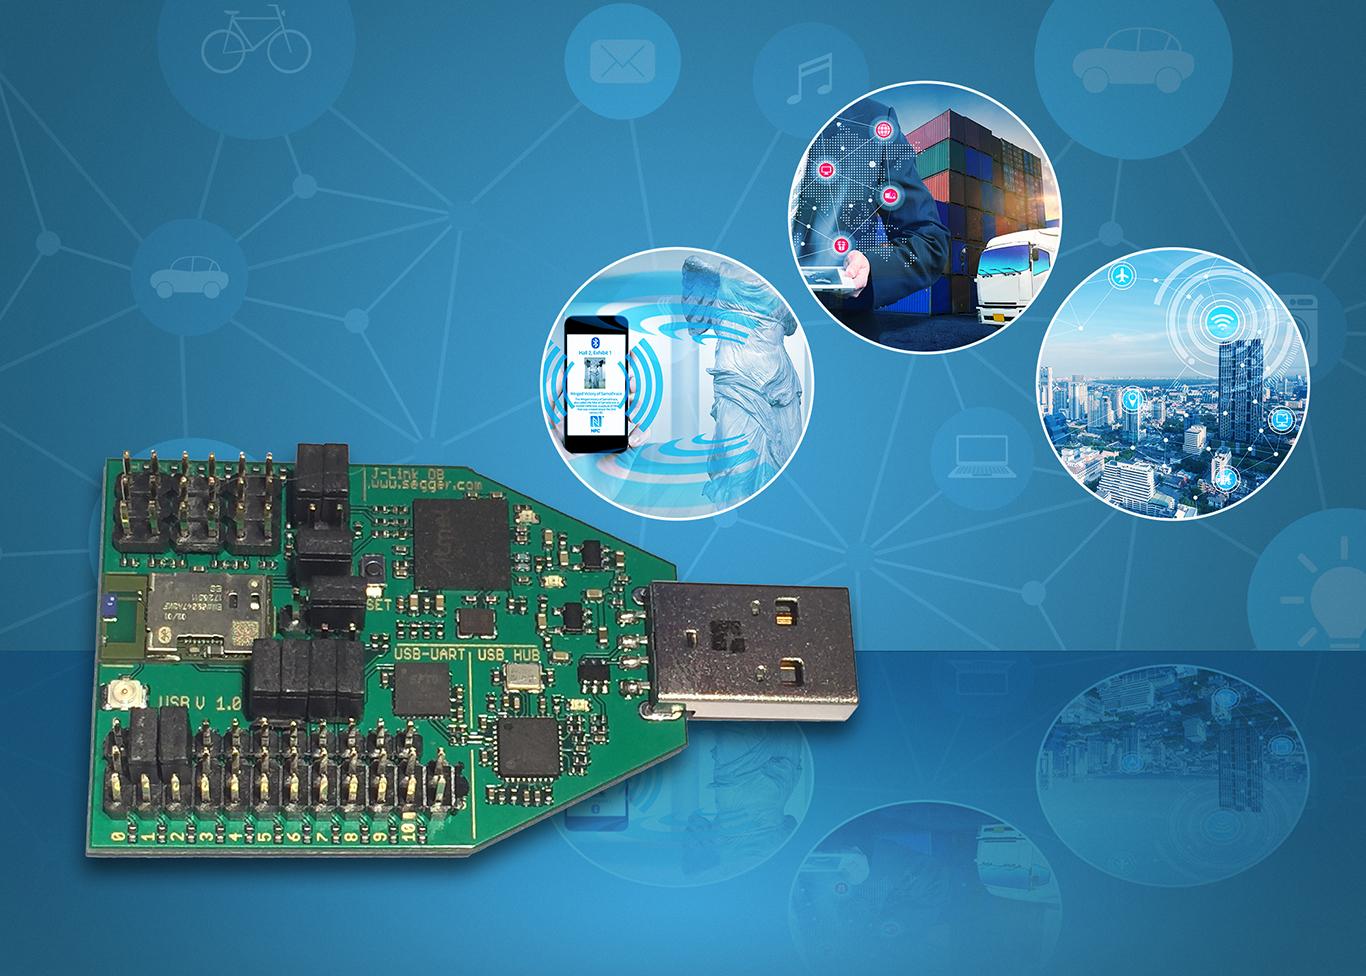 Toshiba brings out USB-based BLE development platform